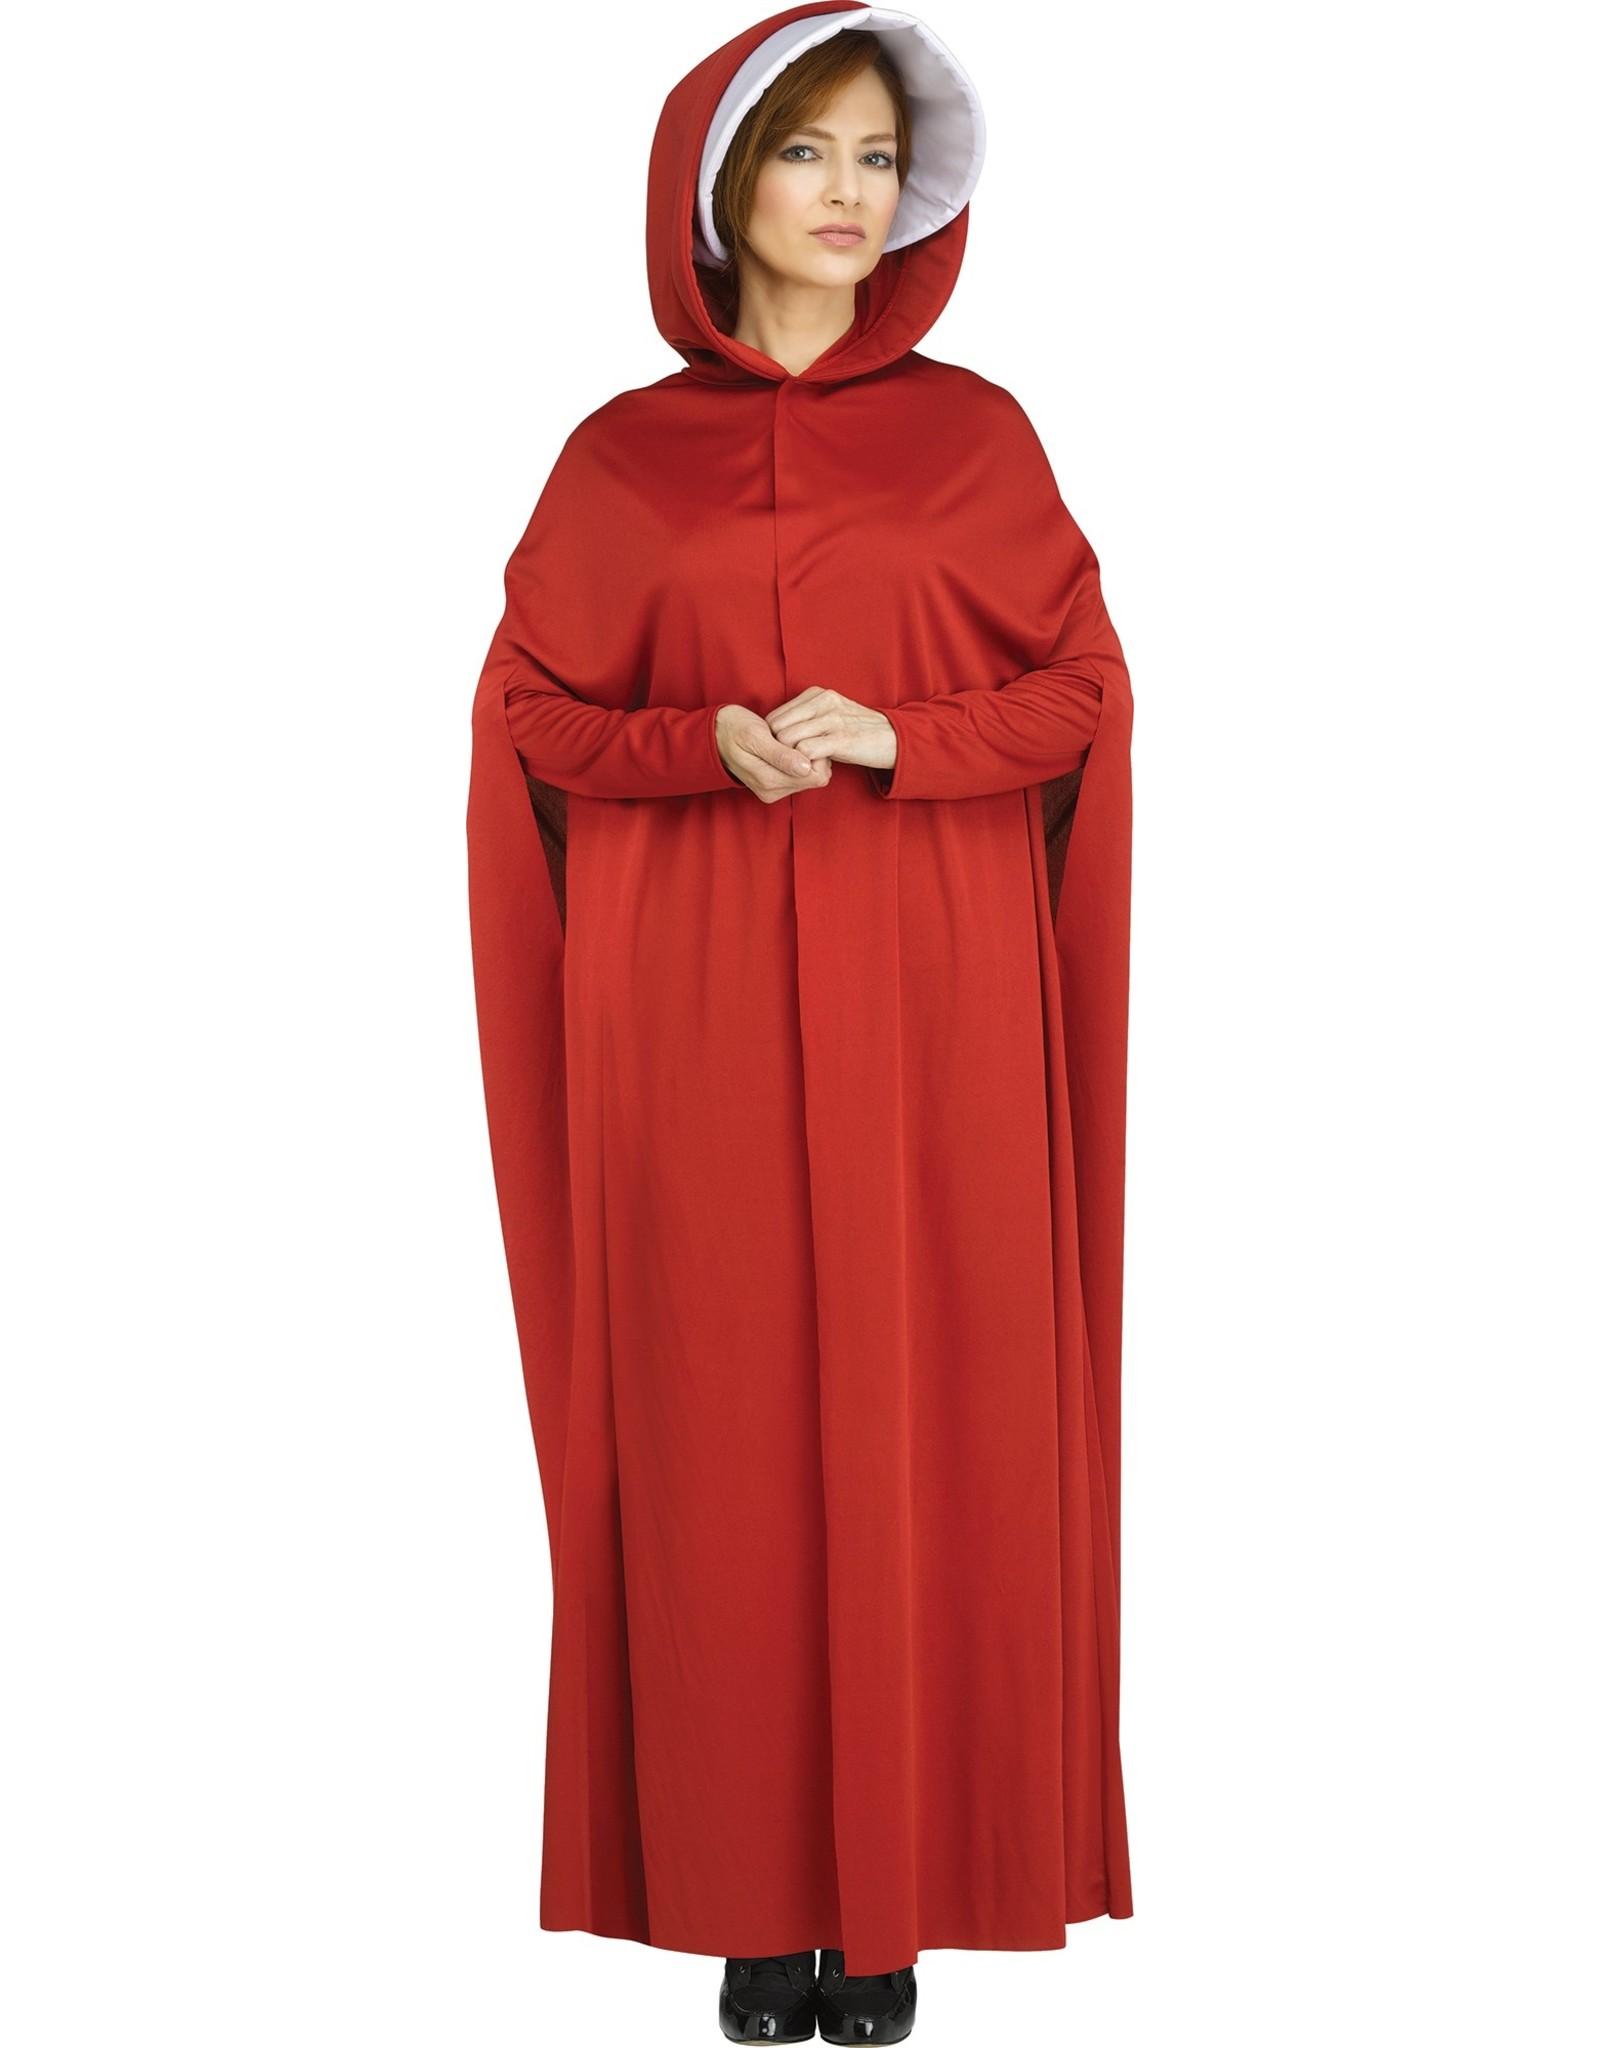 Funworld The Red Maiden